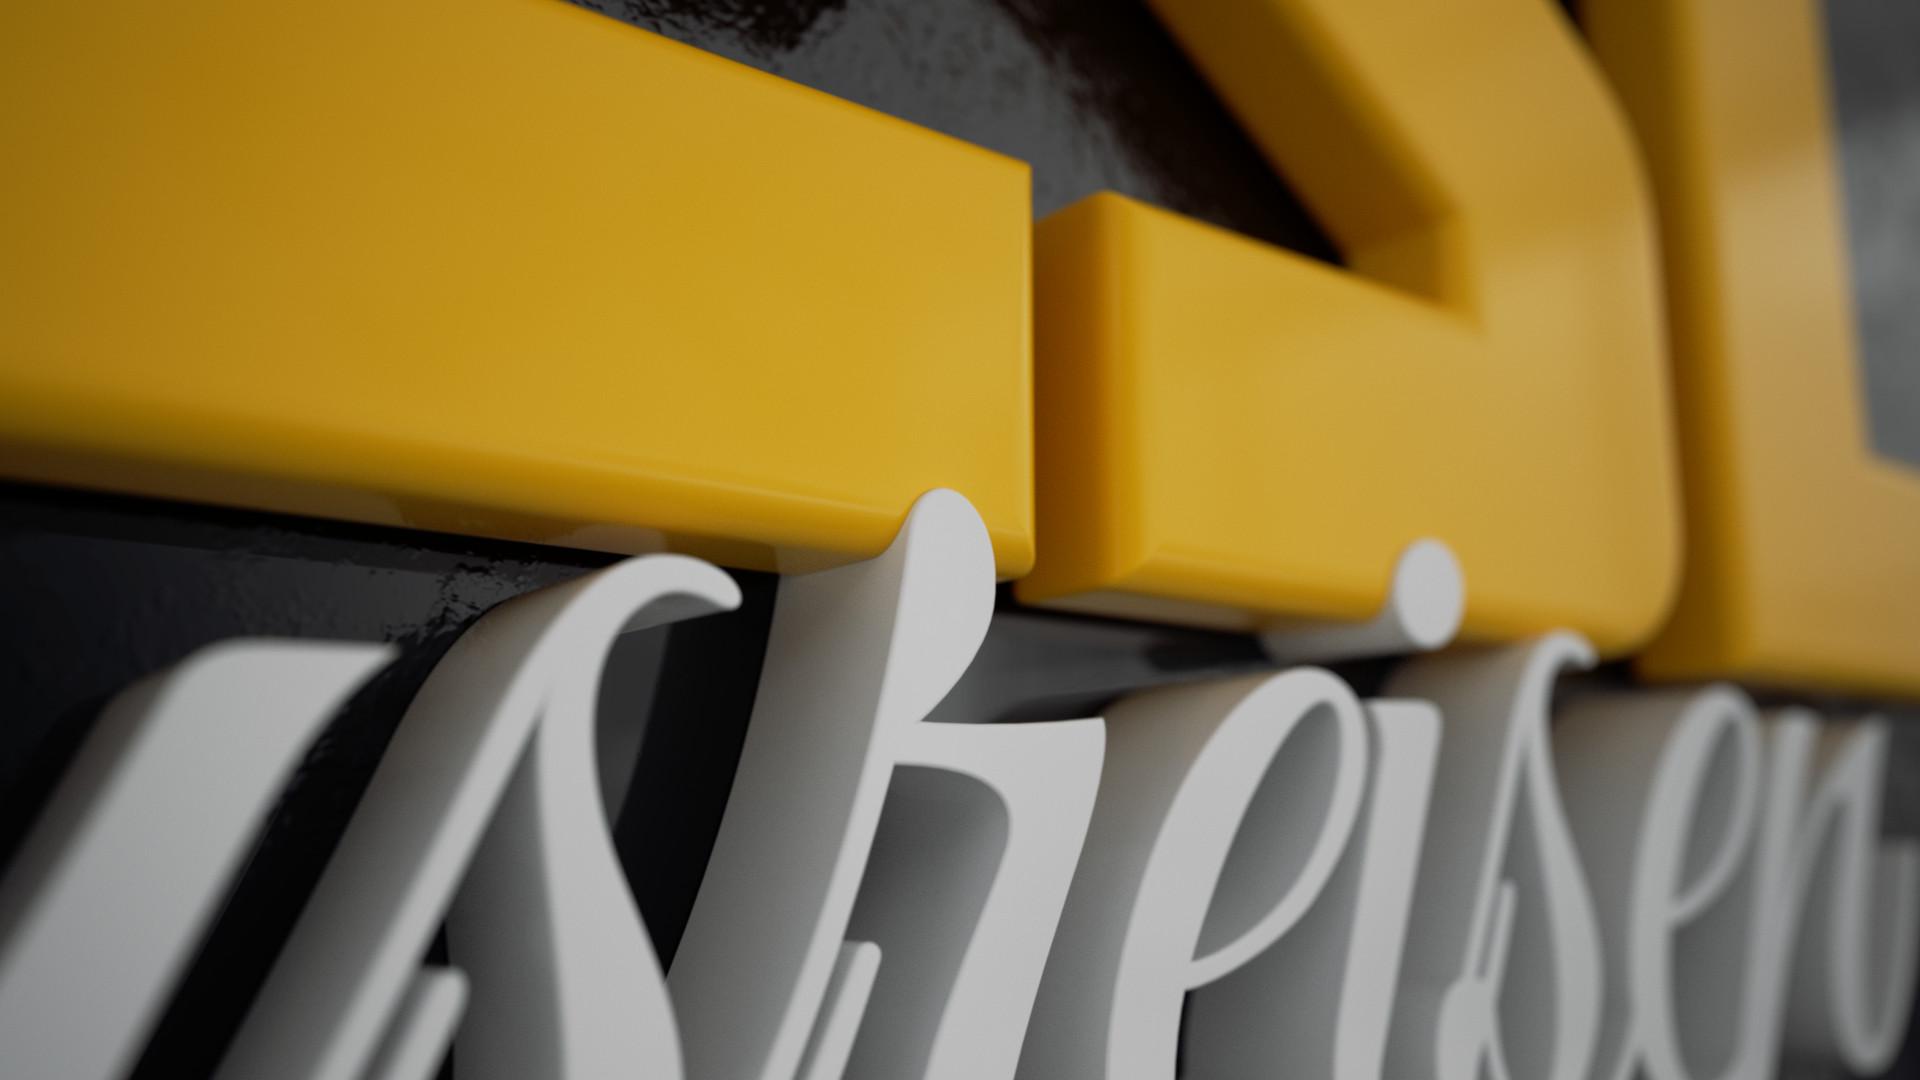 Reinhard kepplinger kiesl logo v4 arion test sl 11 19 min aa2 pixrad 08 gi8 yellow kiesl carpaint cam2 frame55 new back16k